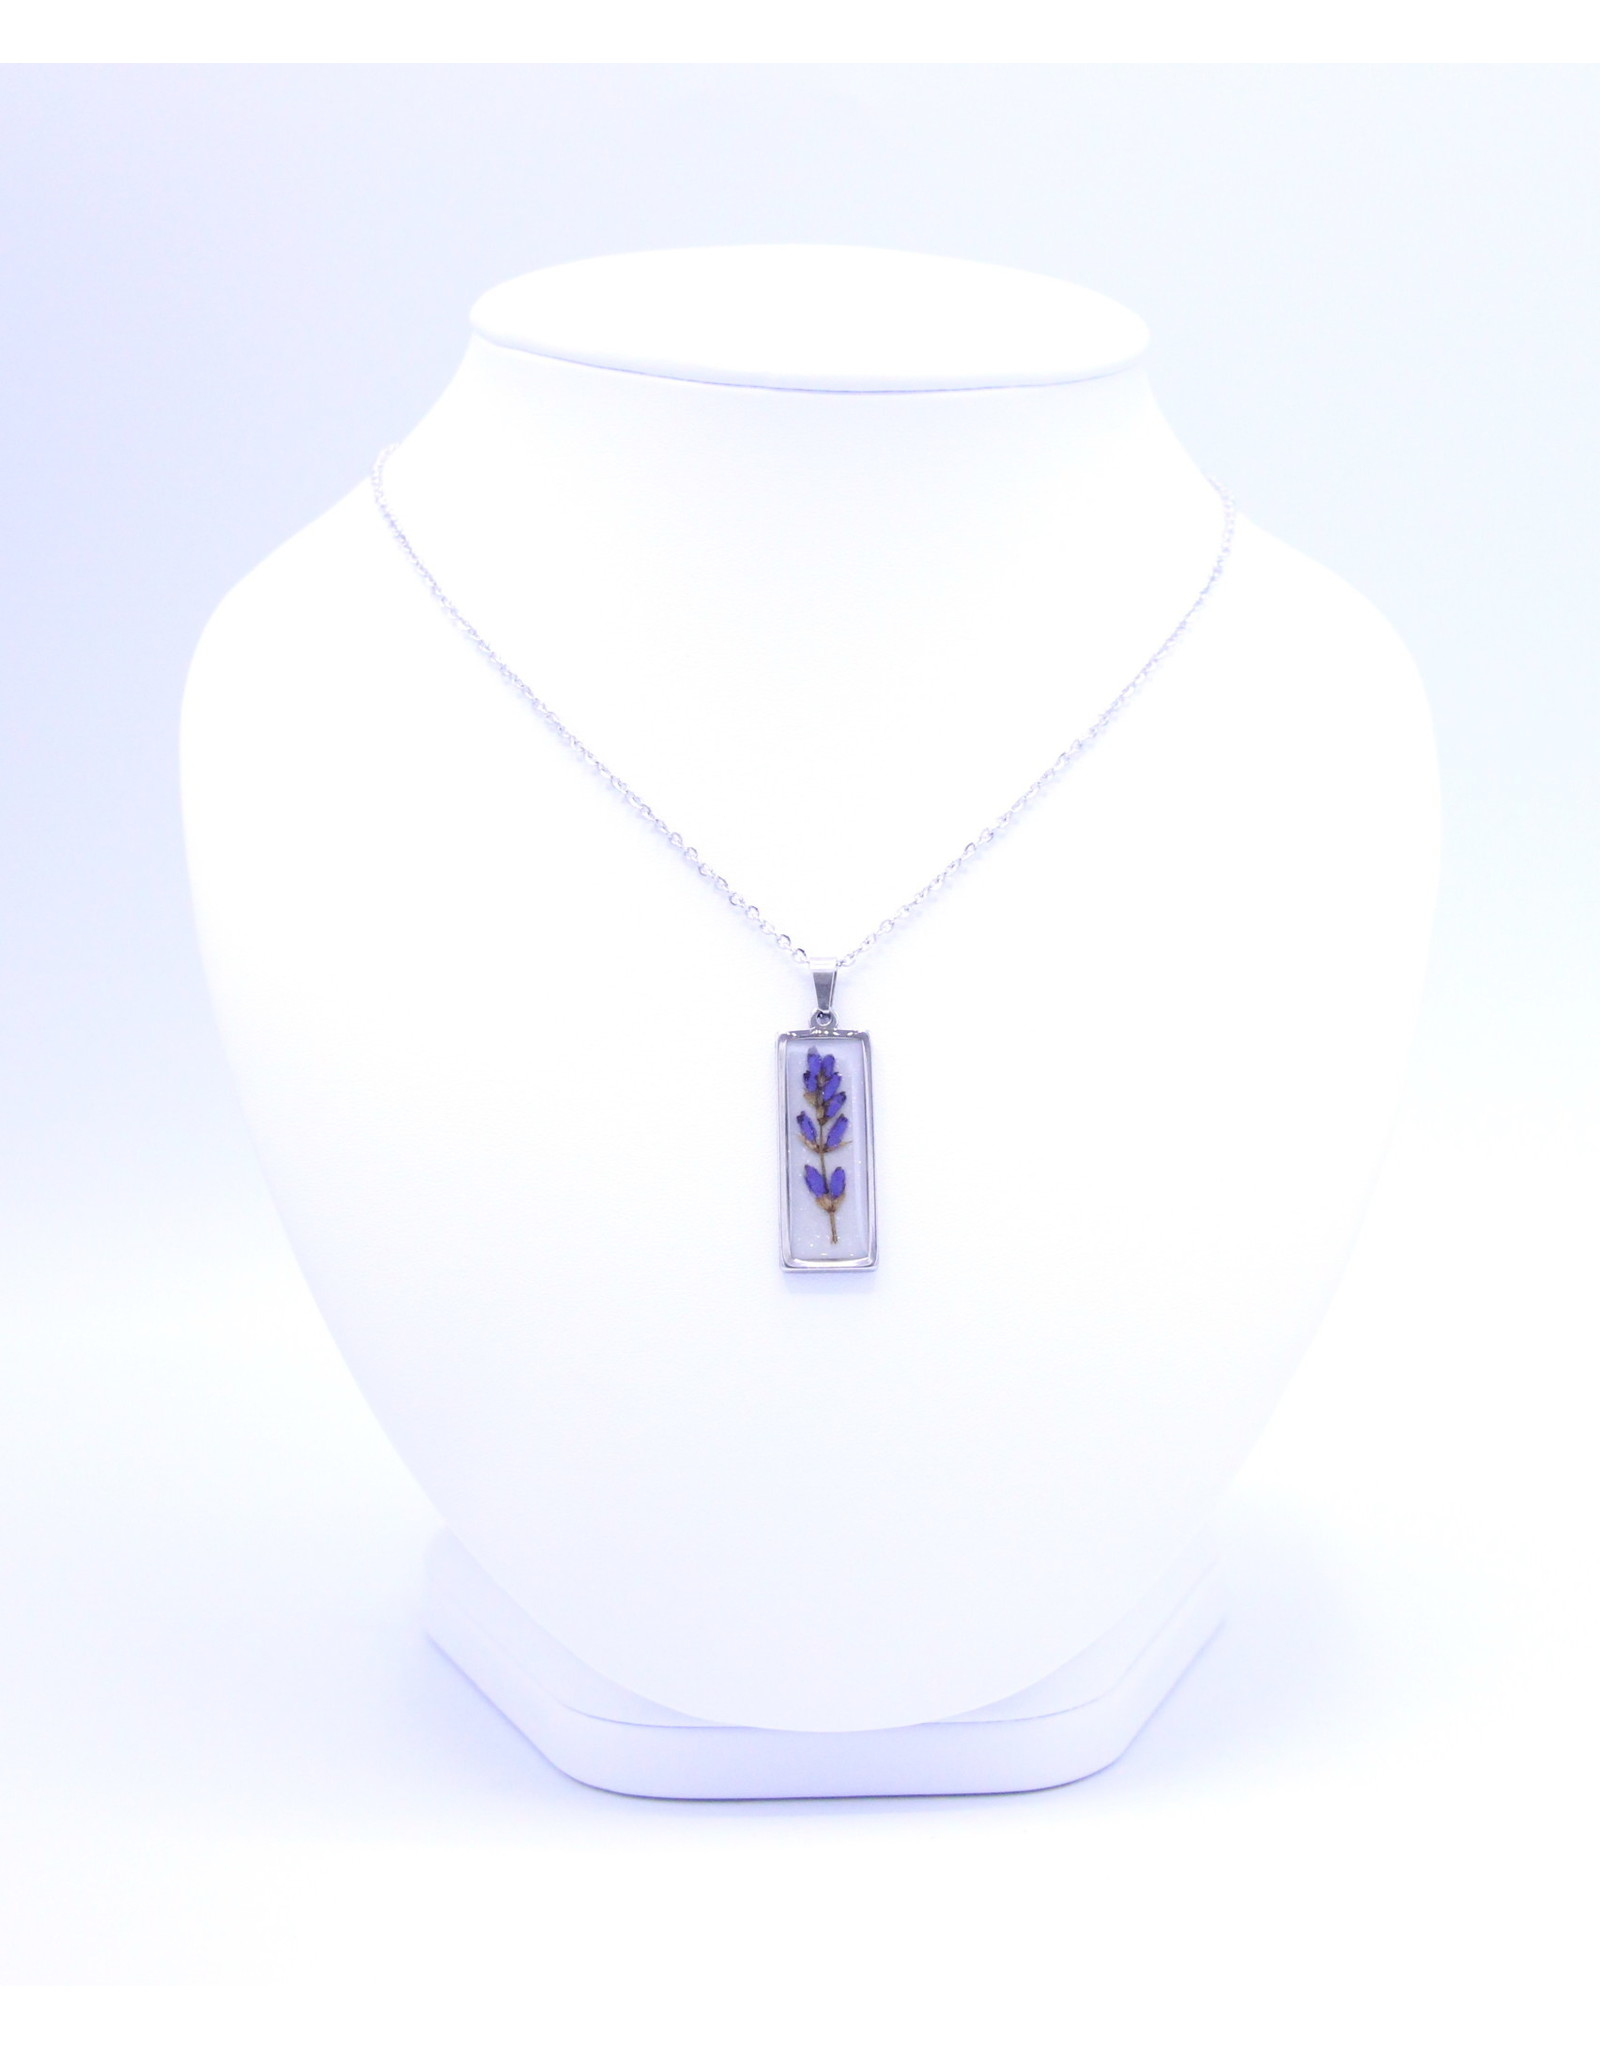 25mm Lavender Necklace - N25L1